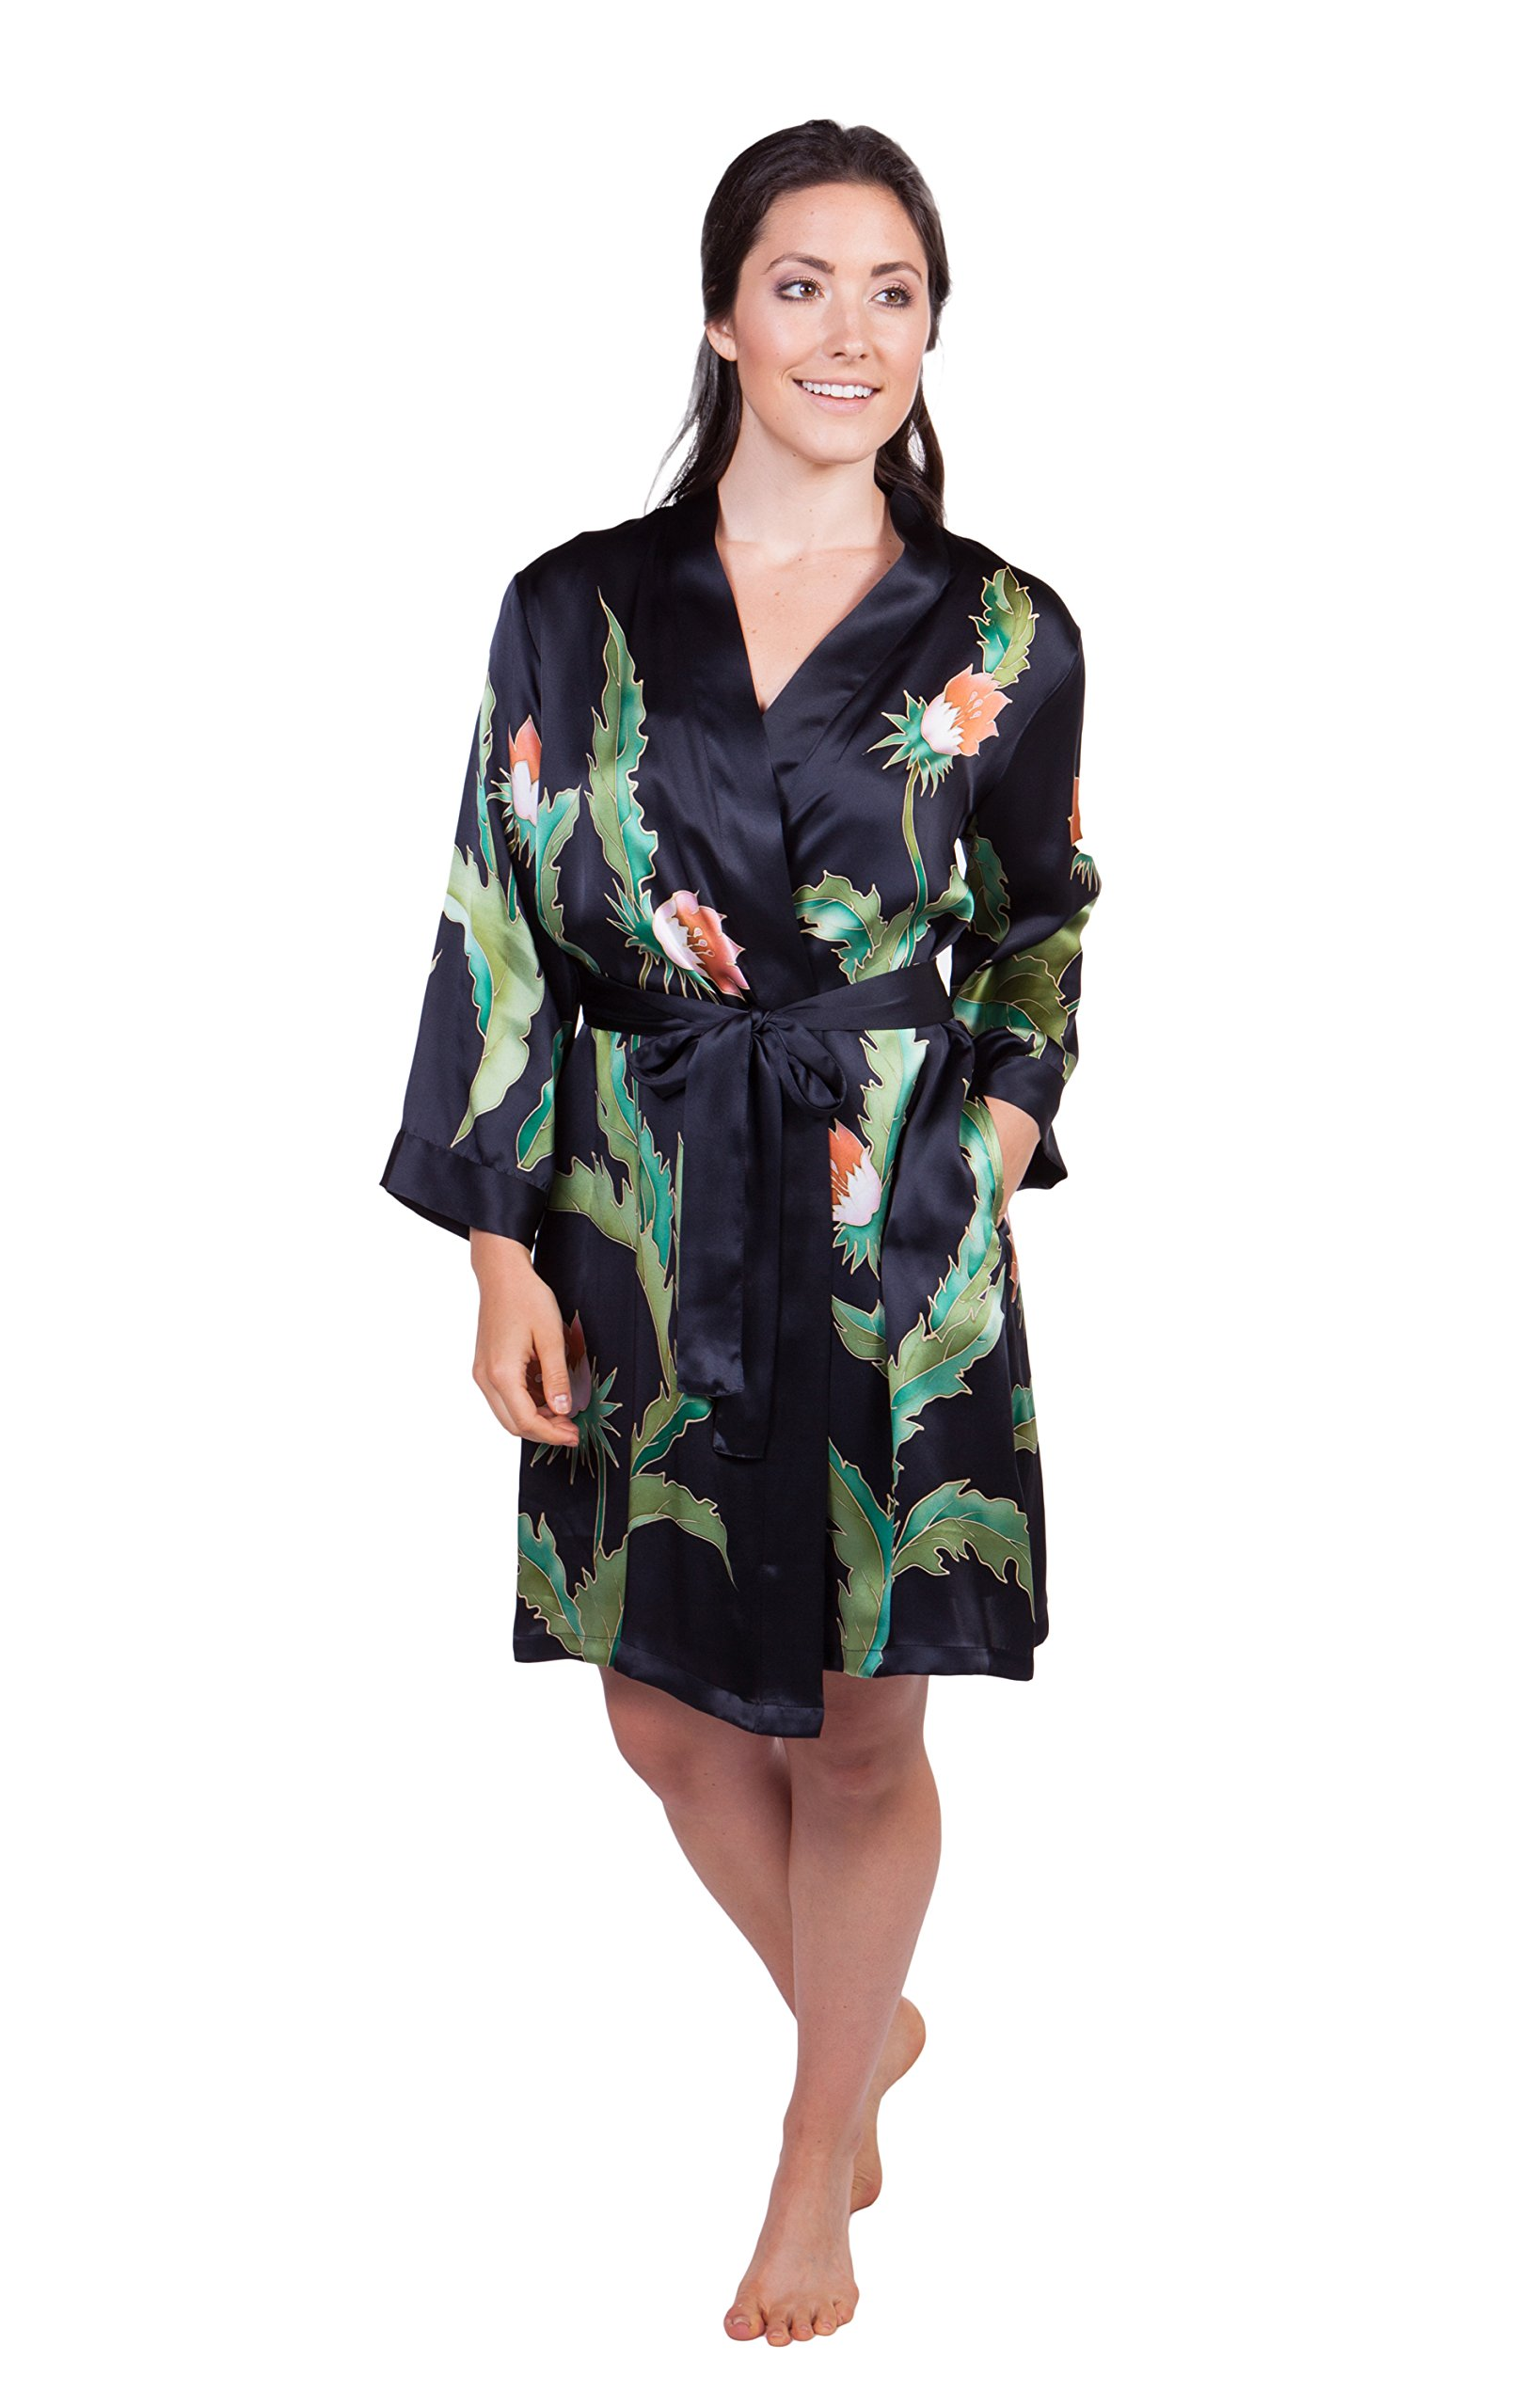 Women's Silk Nightgown Robe Set - Luxury PJs by TexereSilk (Desert Flower, Black, Small) Top Christmas Gift for Wife Girlfriend WS0603-BLK-S